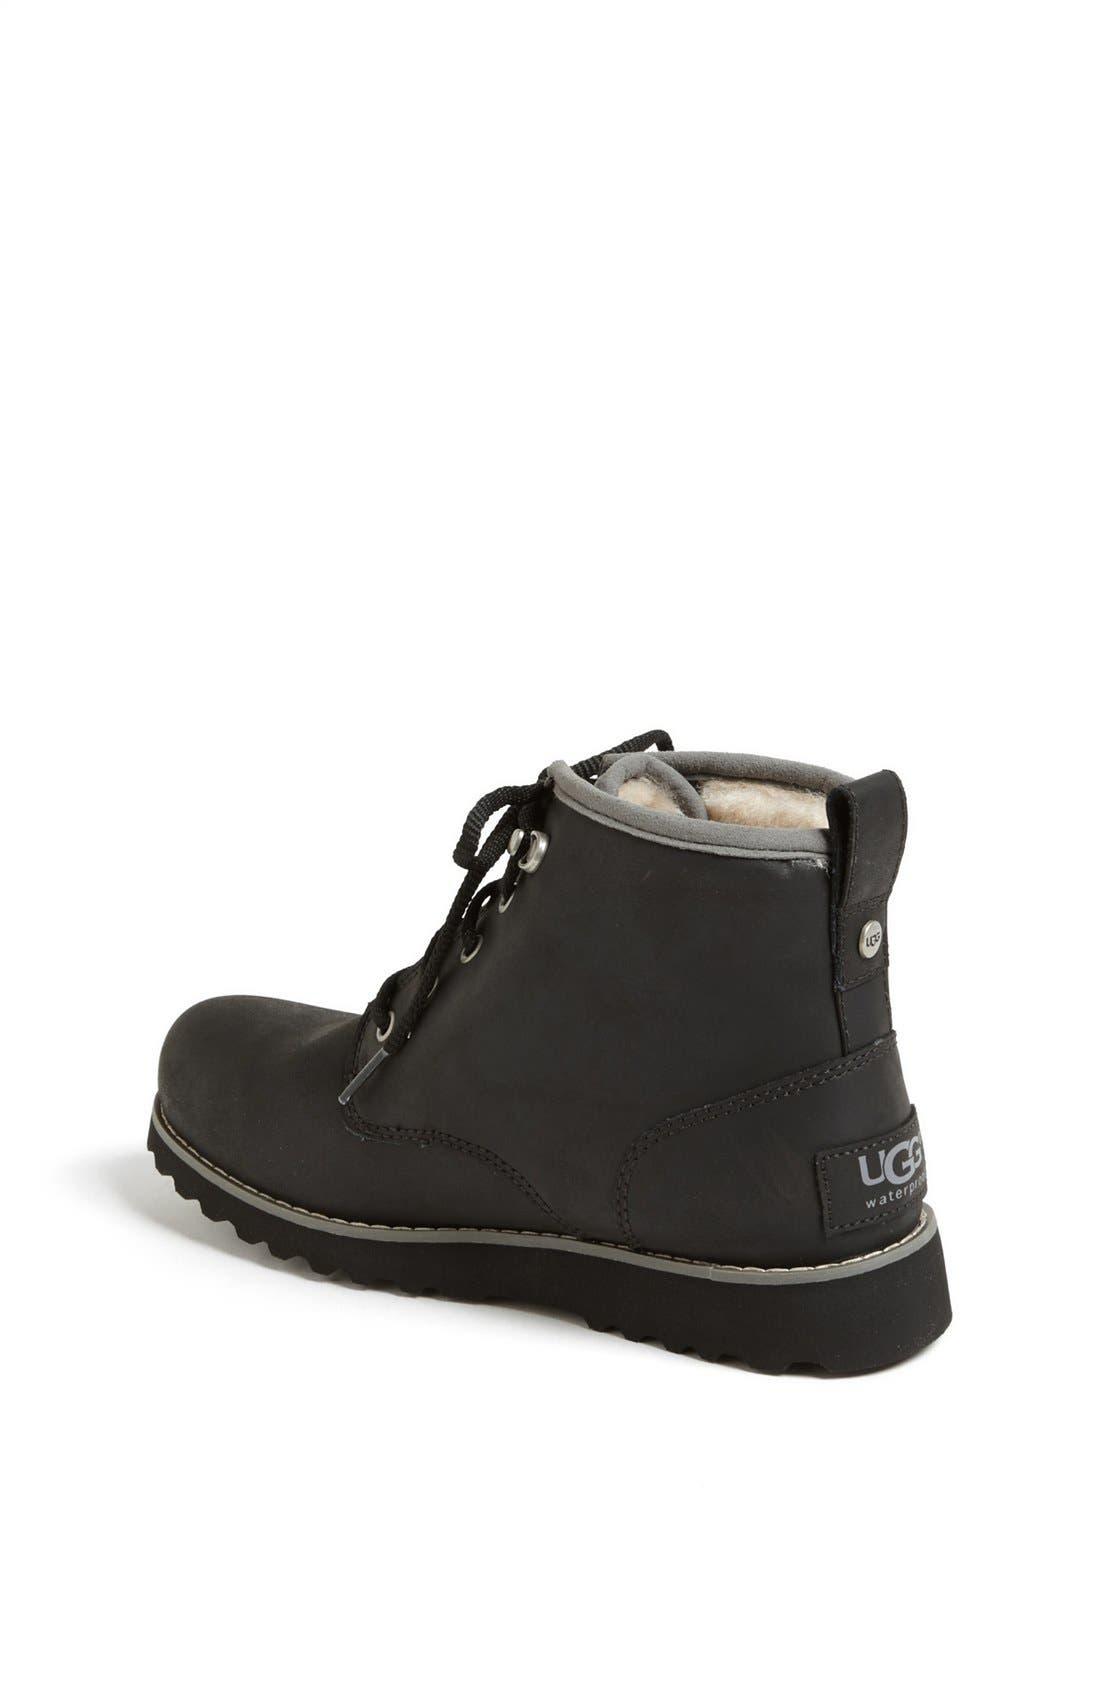 Alternate Image 2  - UGG® 'Maple' Boot (Toddler, Little Kid & Big Kid)